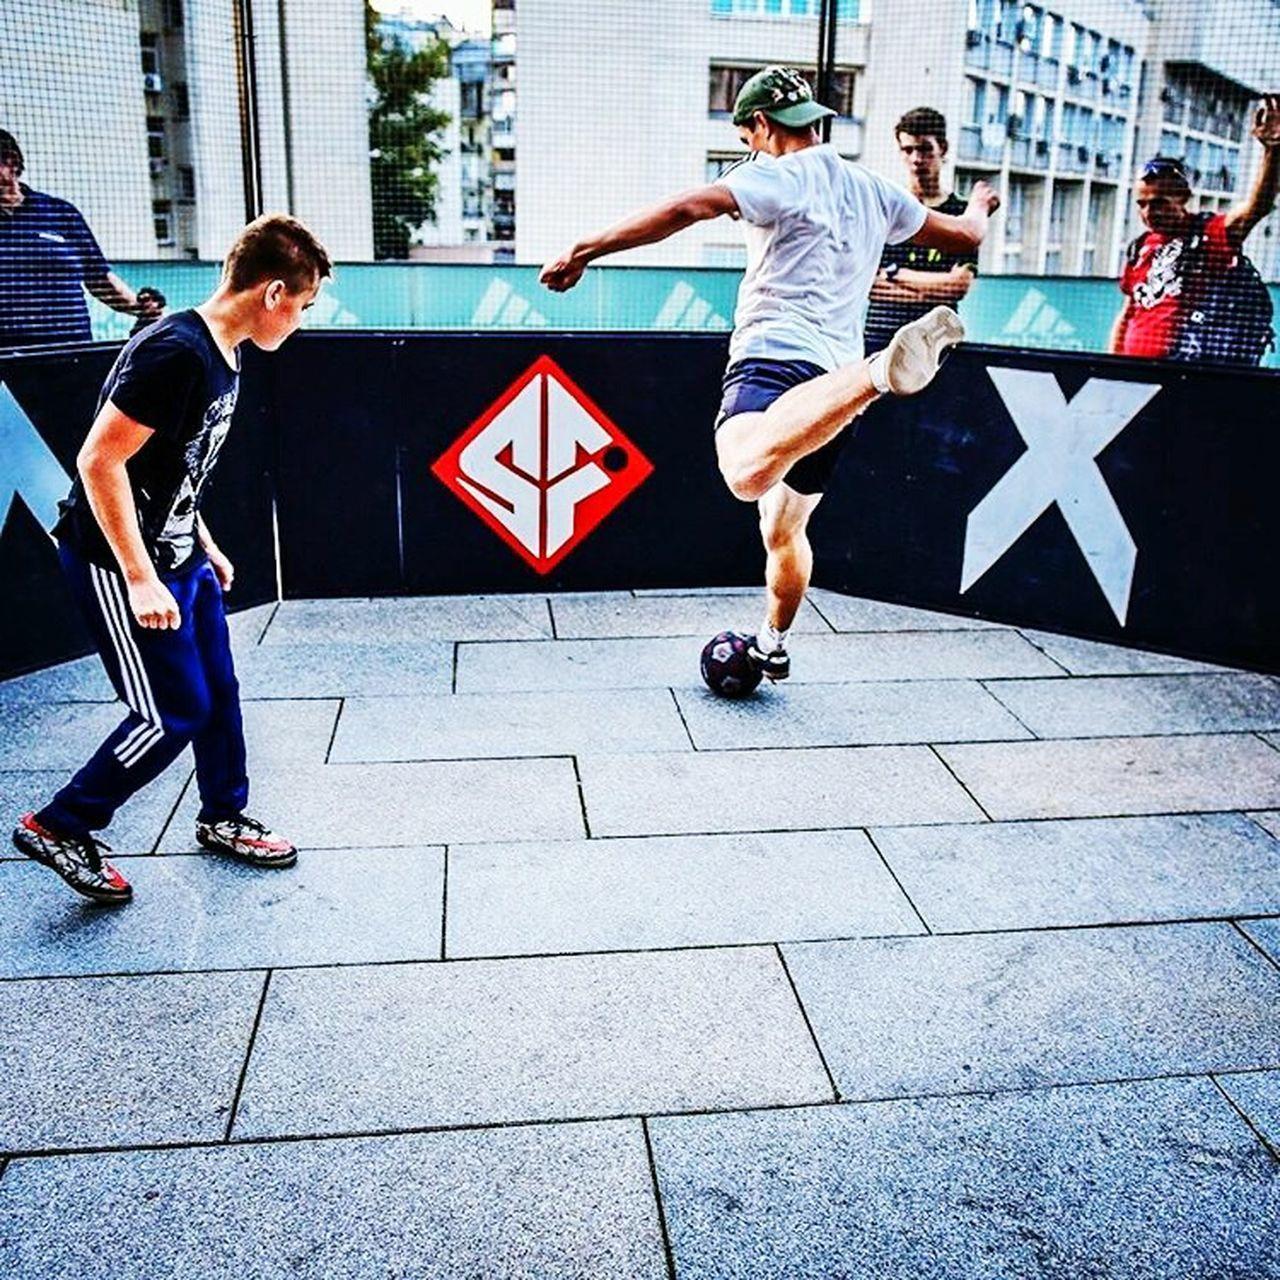 Wine Moments Football Player Like4like Streetfootball шоу 433 Show Street Art Likeforlike Украина♥ Киев футбол Skills  Master Class Football Freestyle